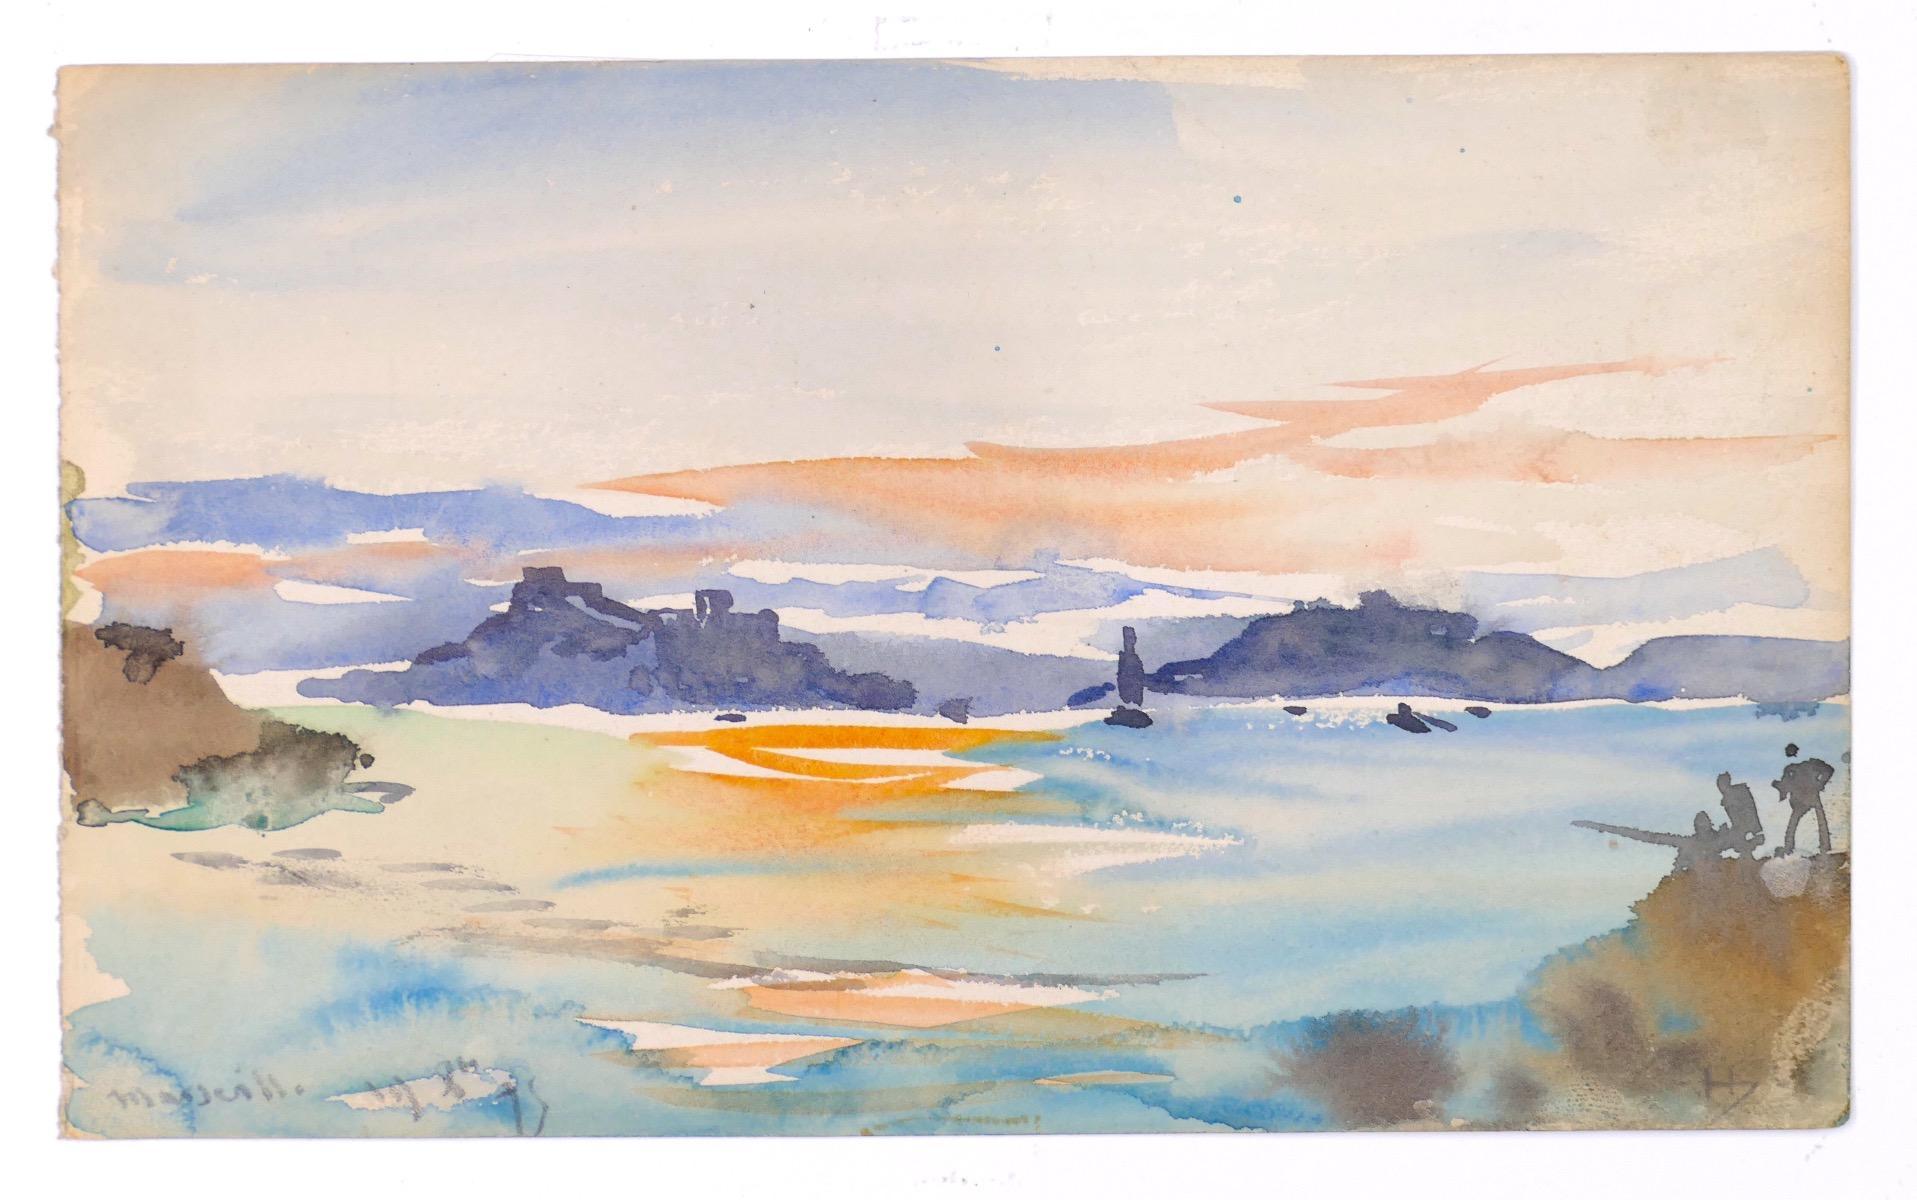 Marseille 1875 - Original Watercolor by Tony Johannot - 19th Century